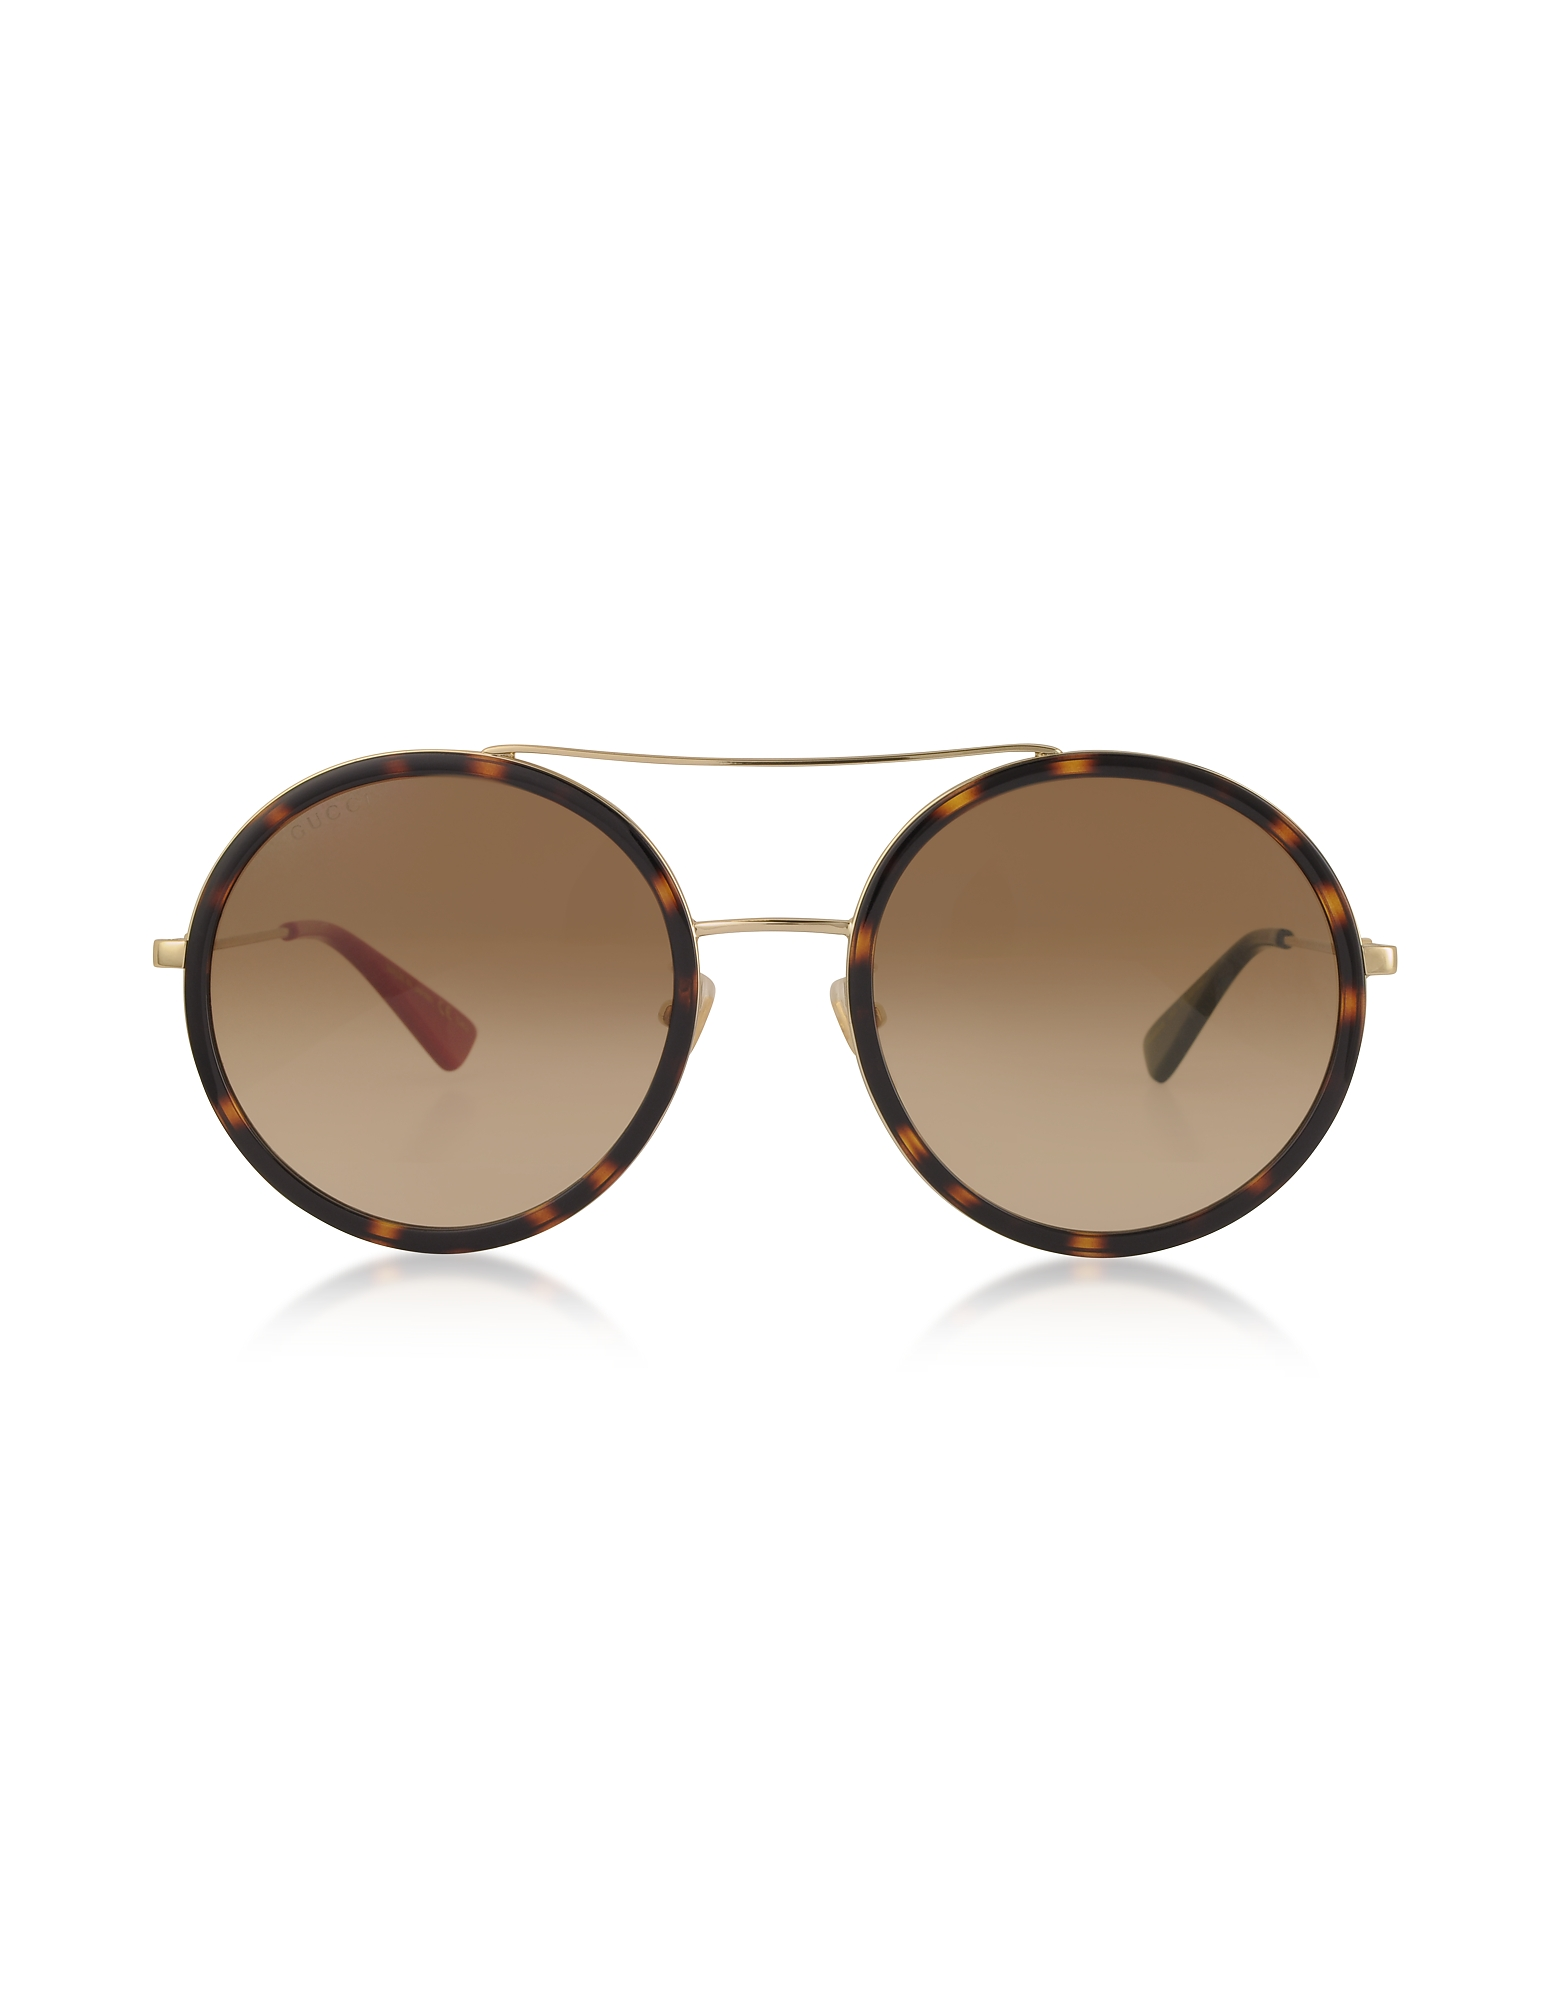 Gucci Designer Sunglasses, Round-frame Metal Sunglasses